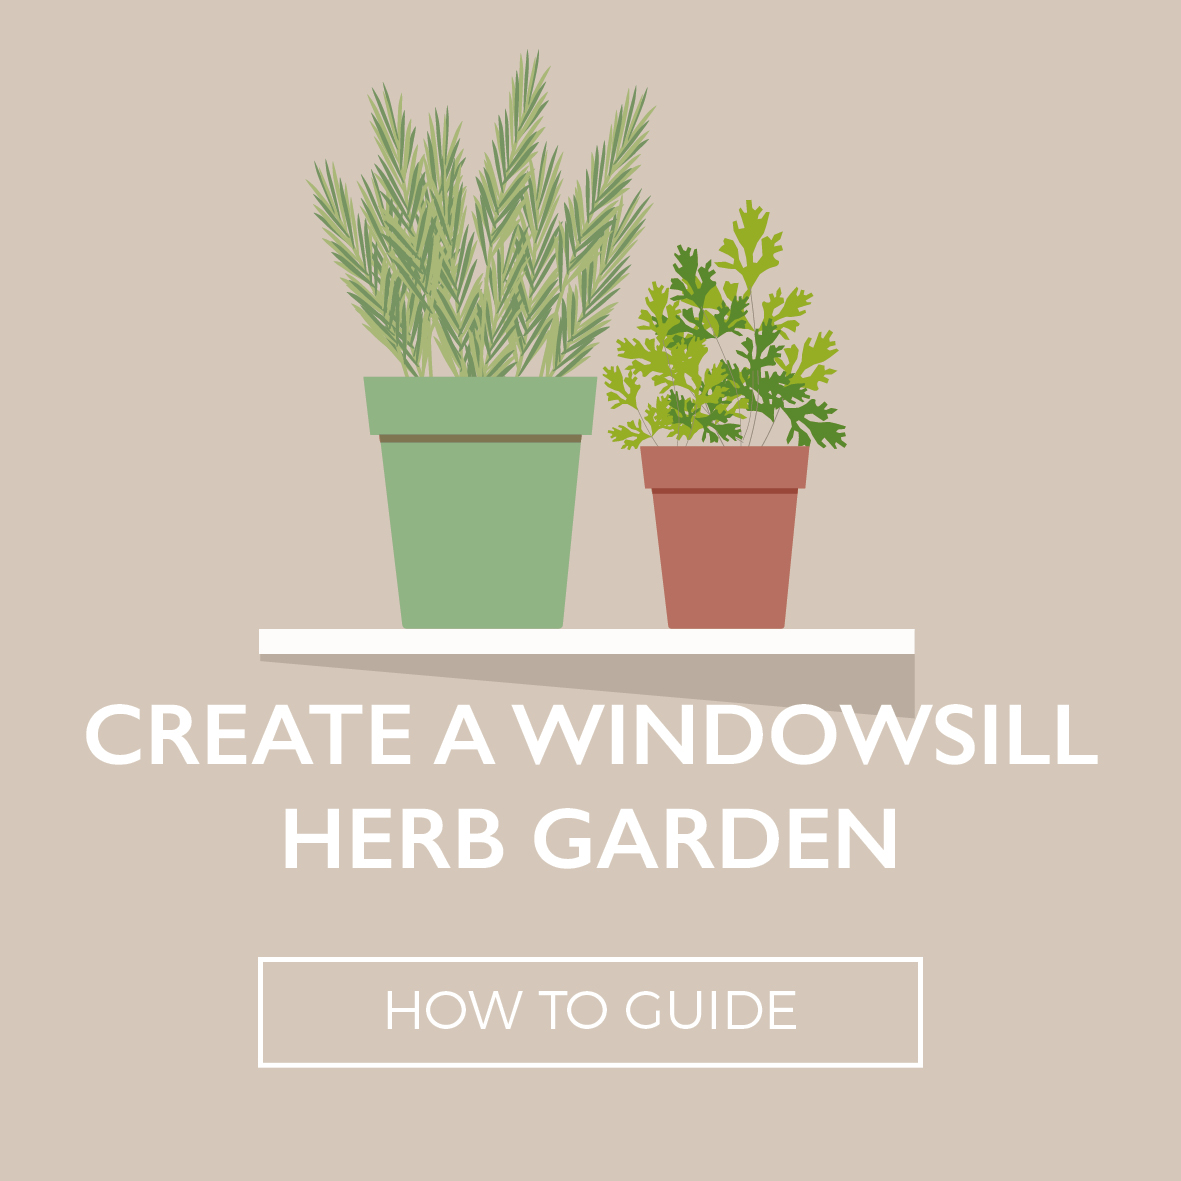 Perrywood-WindowsillHerbGarden2018